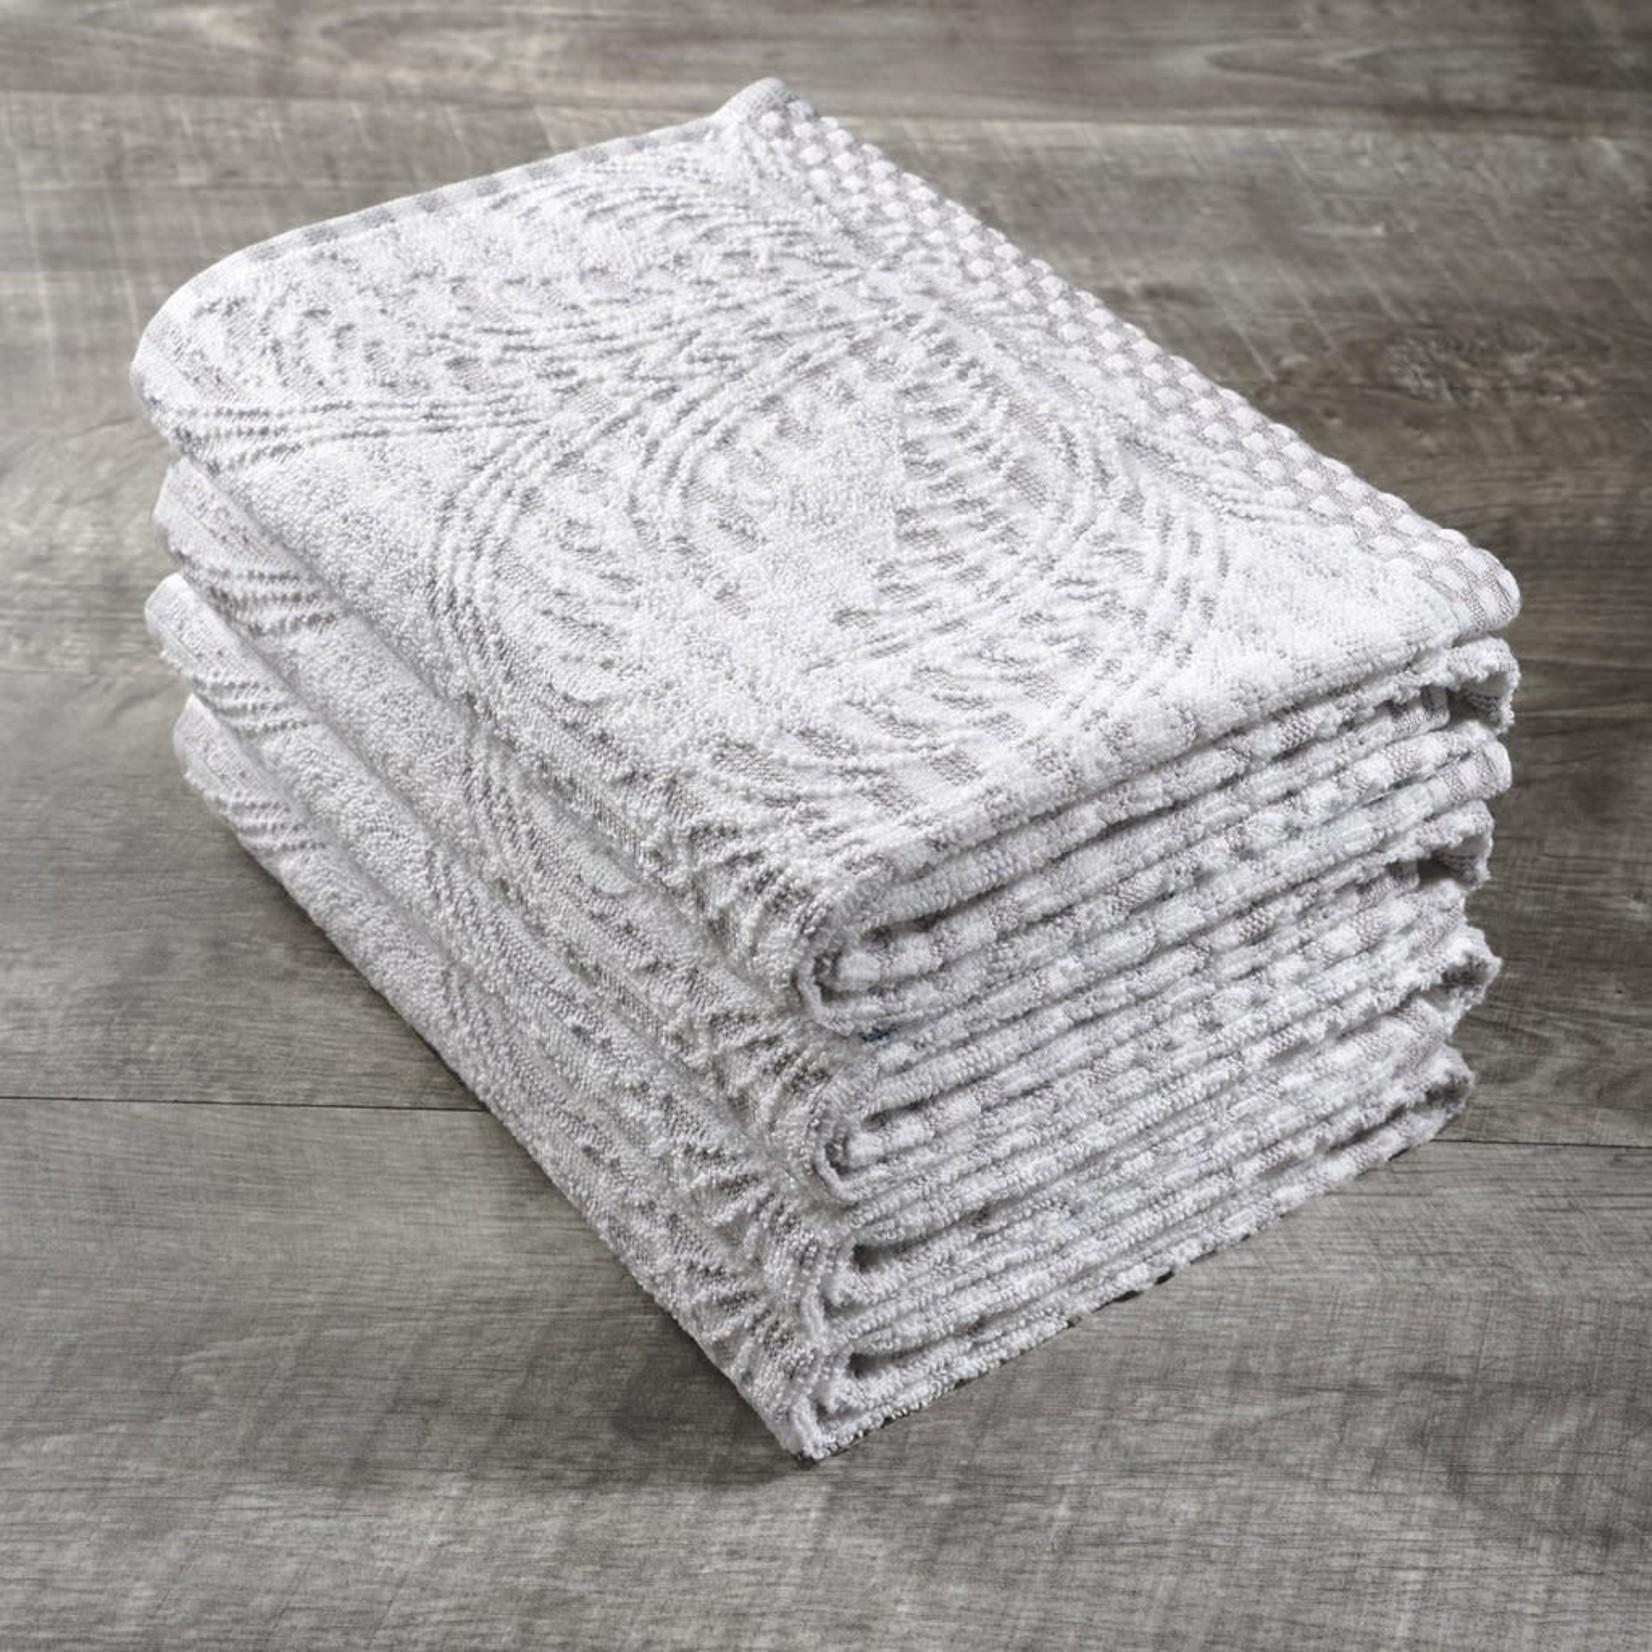 DH Kitchen Towel s/4